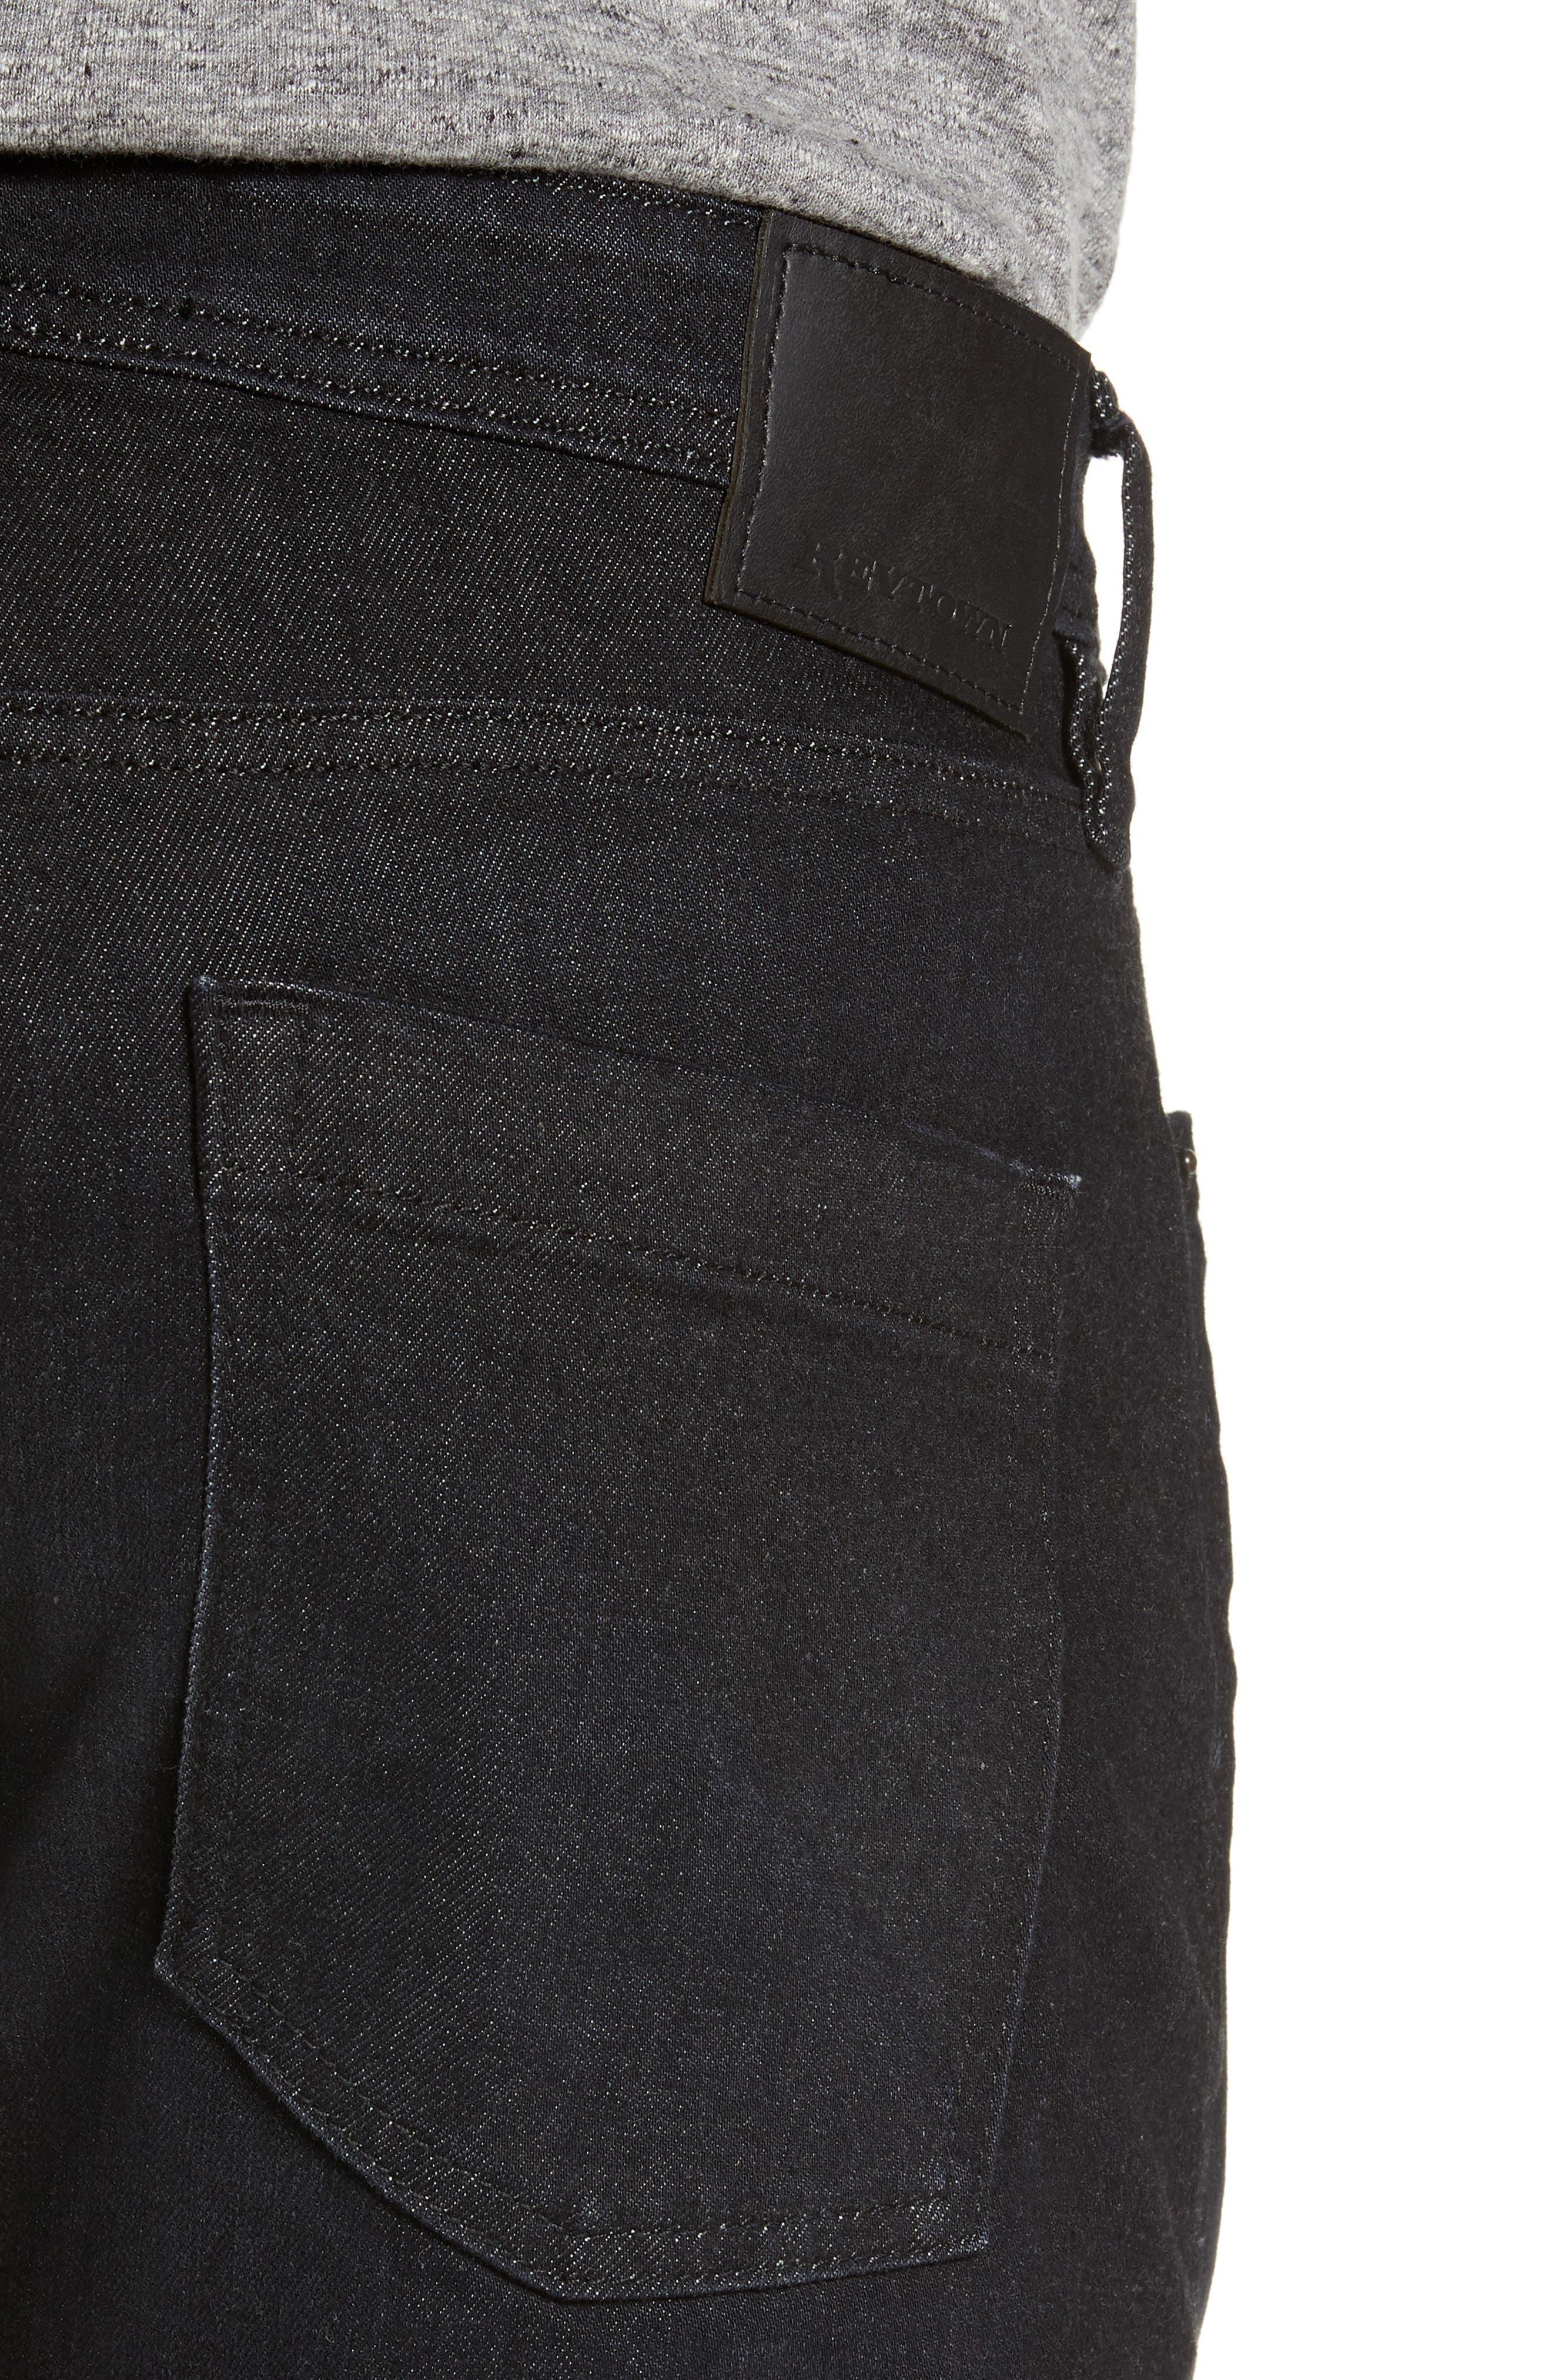 REVTOWN,                             Sharp Slim Fit Jeans,                             Alternate thumbnail 4, color,                             COAL BLACK